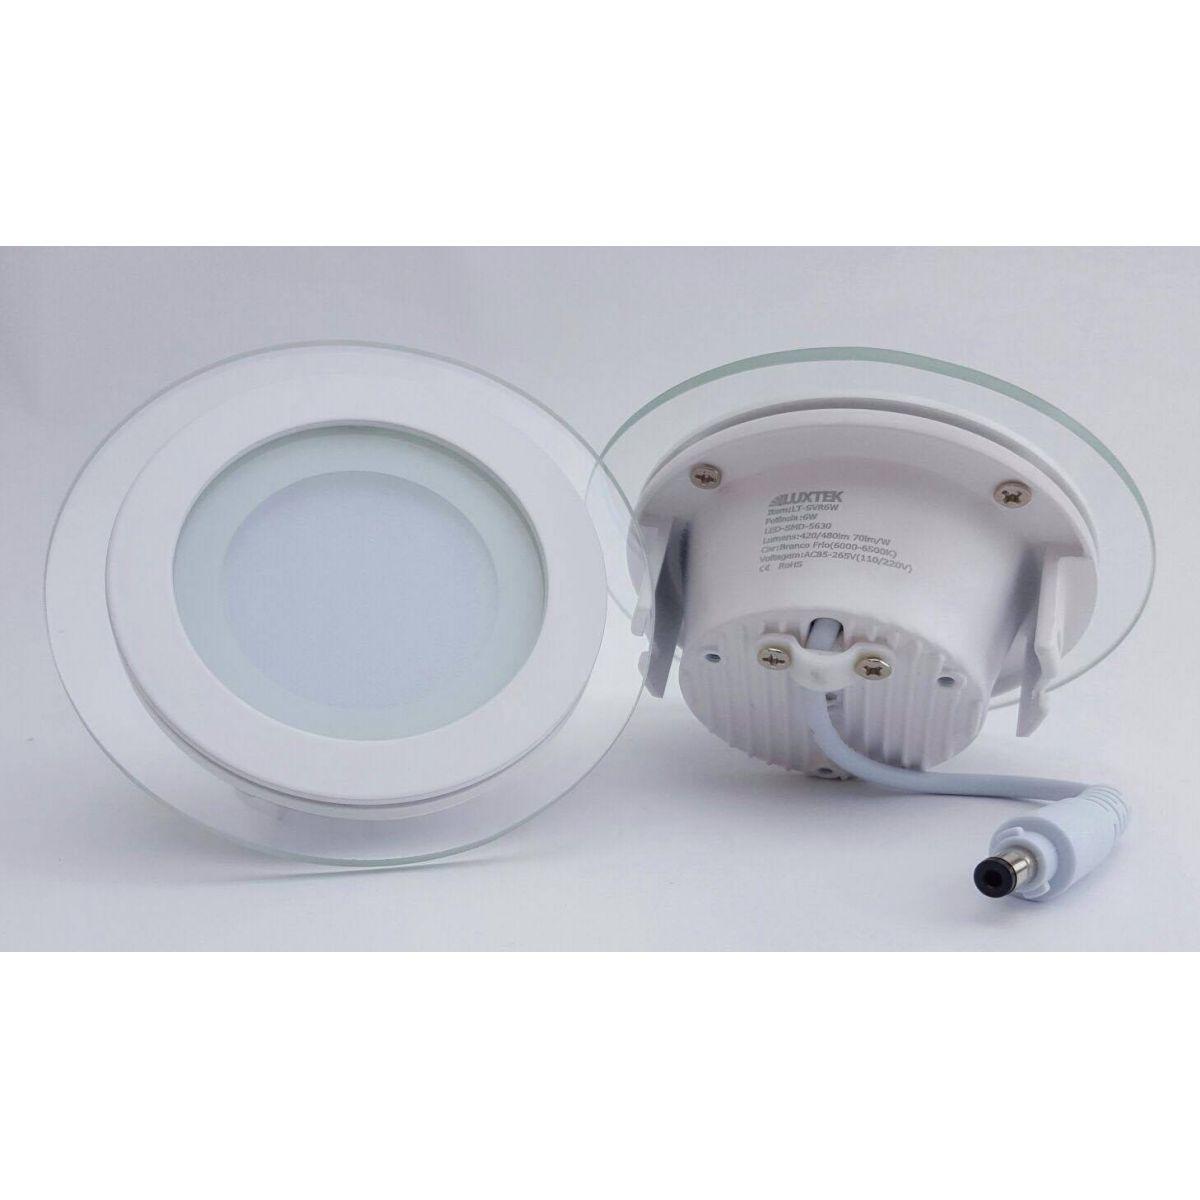 Luminária Plafon LED 12w de Vidro Embutir Branco Frio Redonda / Quadrada  - LUXTEK